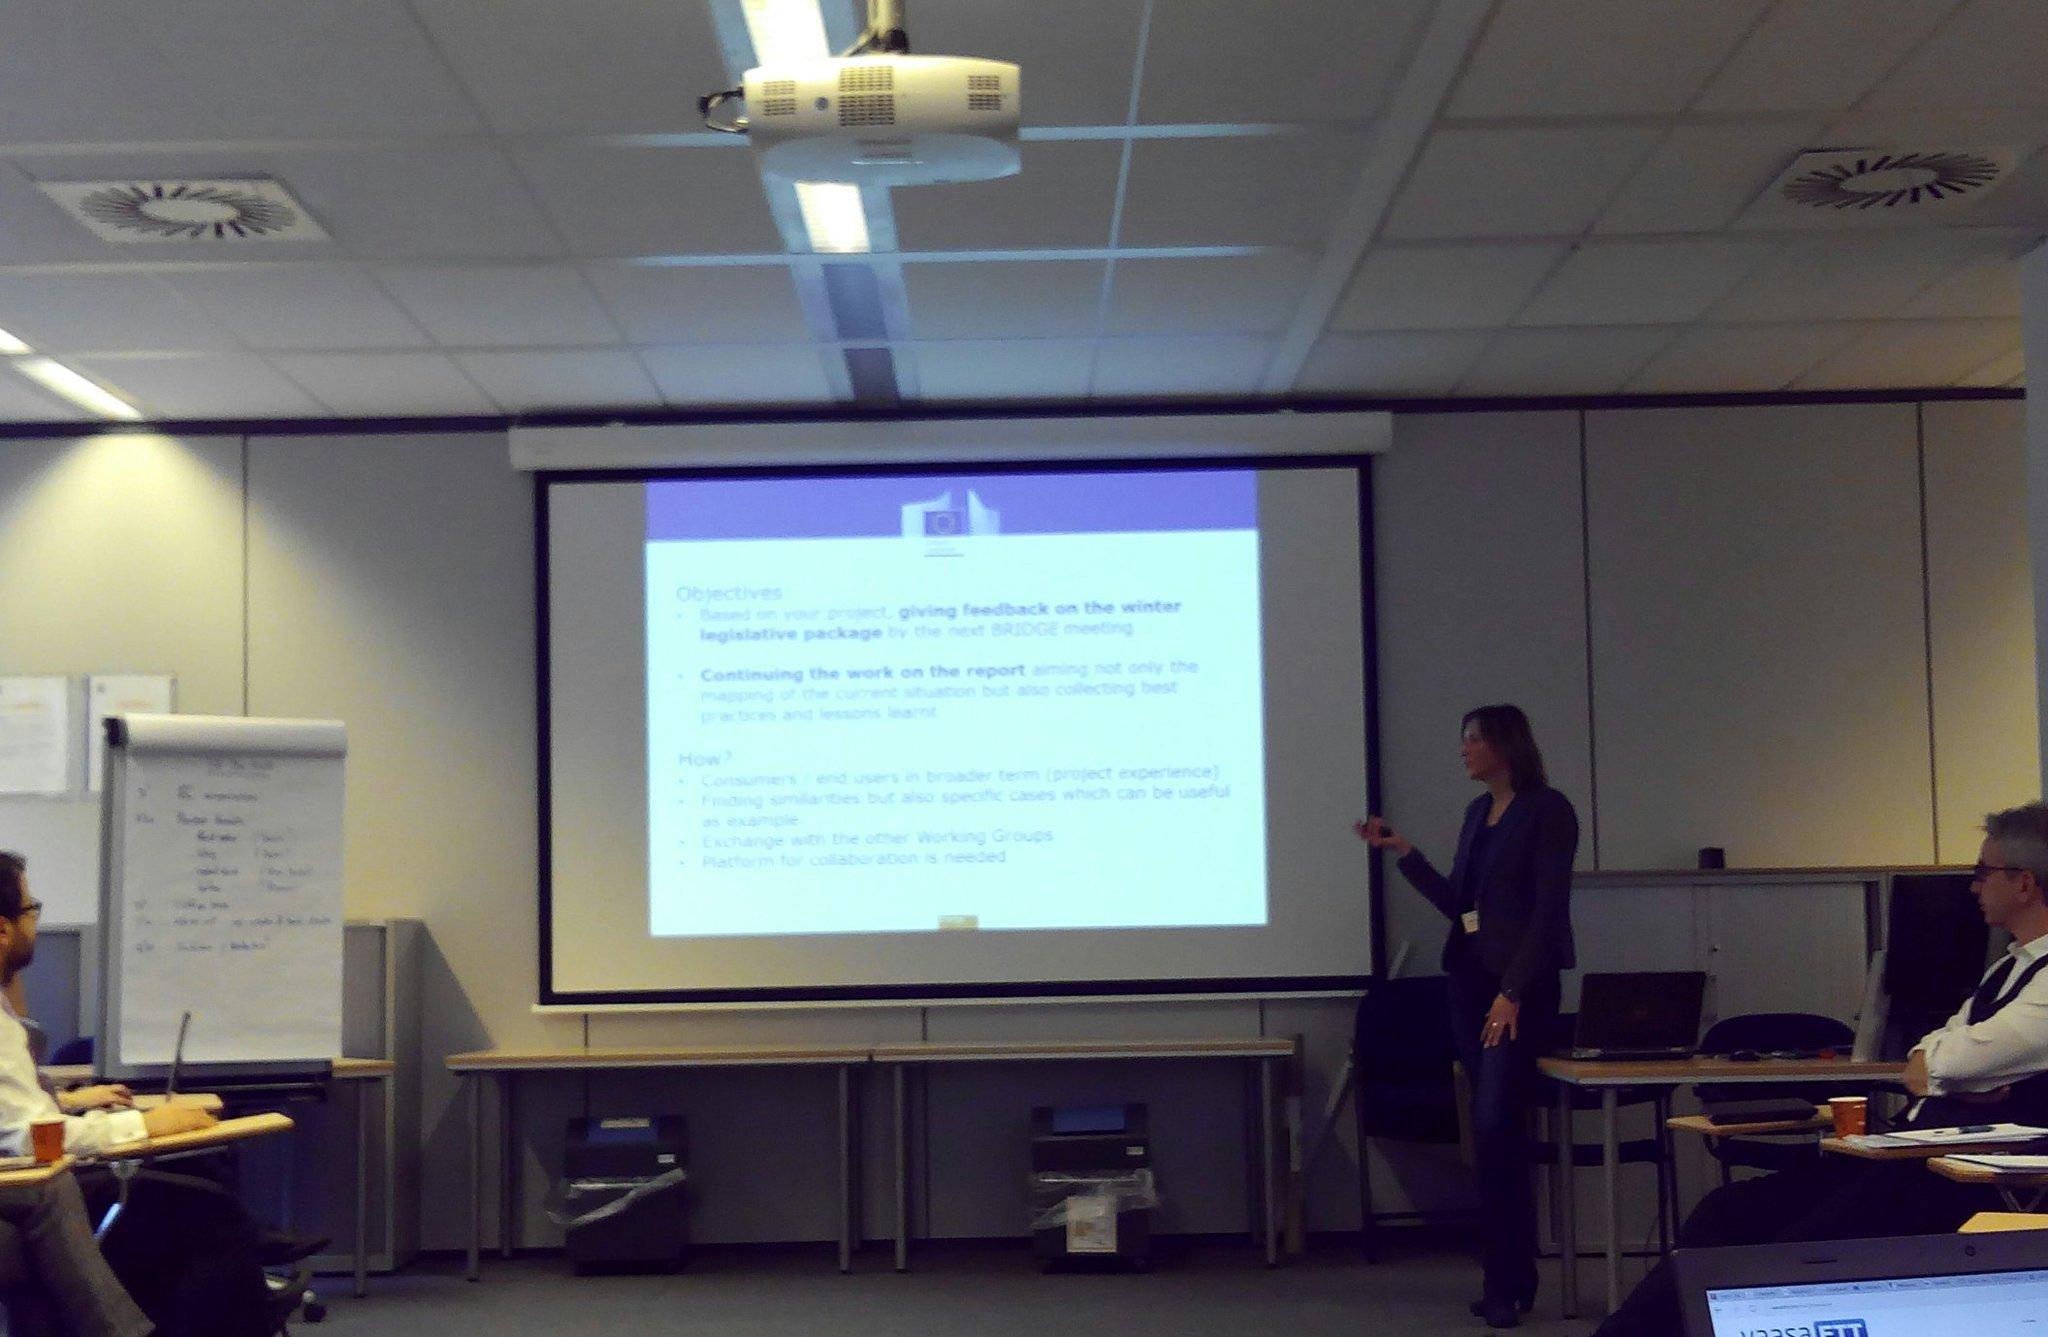 Szilvia Bozsoki has explained the @EU_Commission expectations in the Customer Engagement WG #Bridge_EU https://t.co/tk8uzK00w1